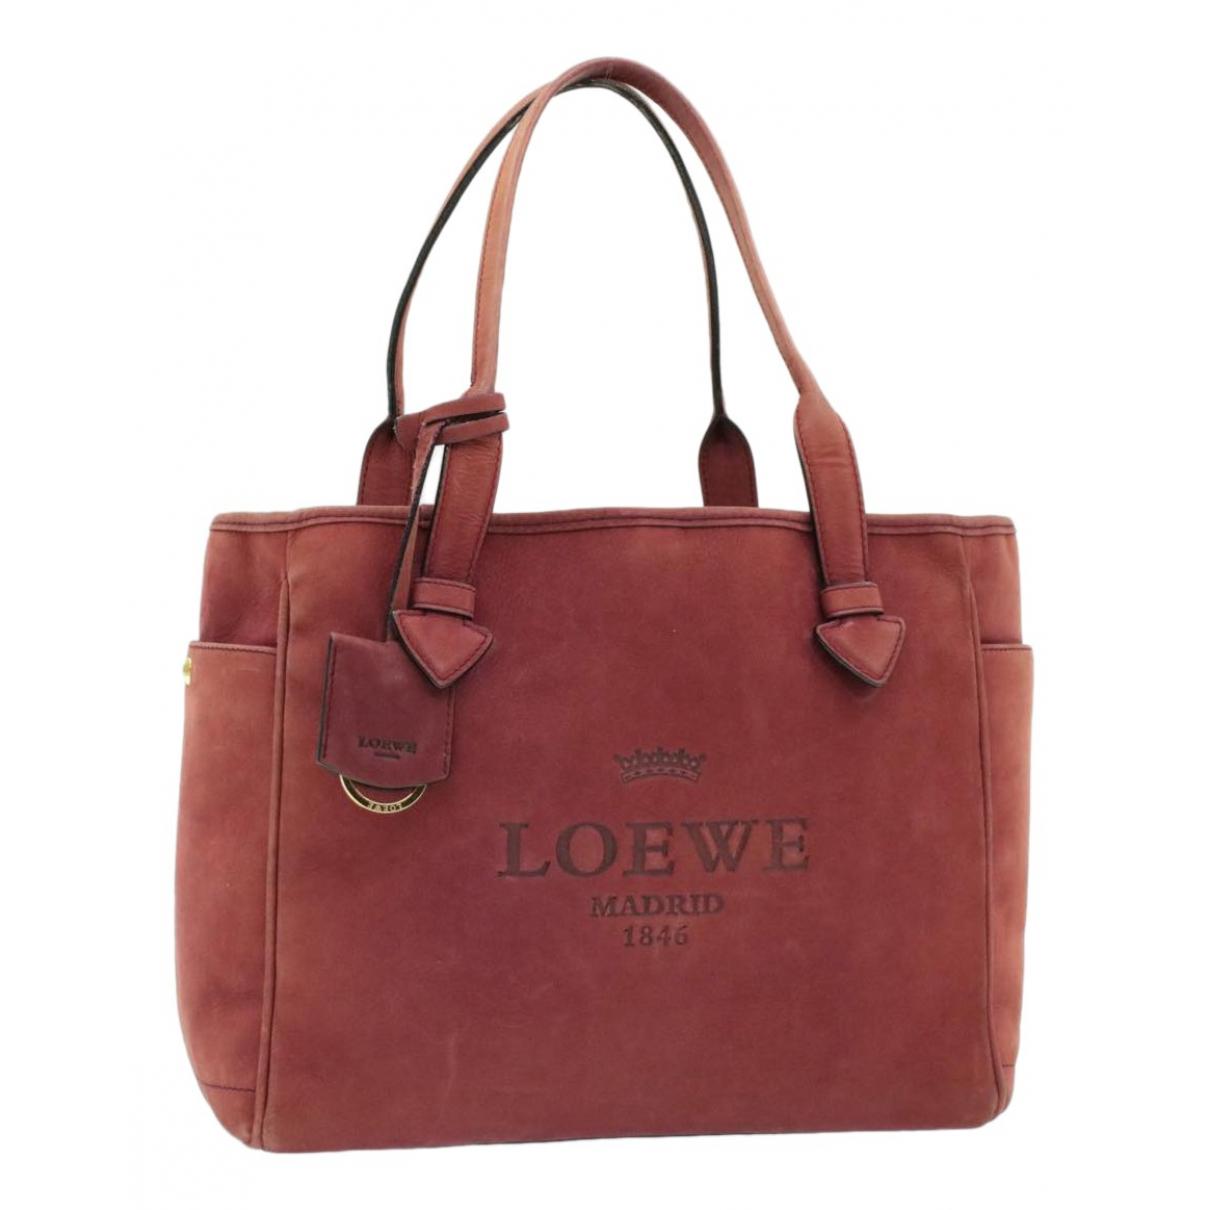 Loewe - Sac a main   pour femme en suede - rouge